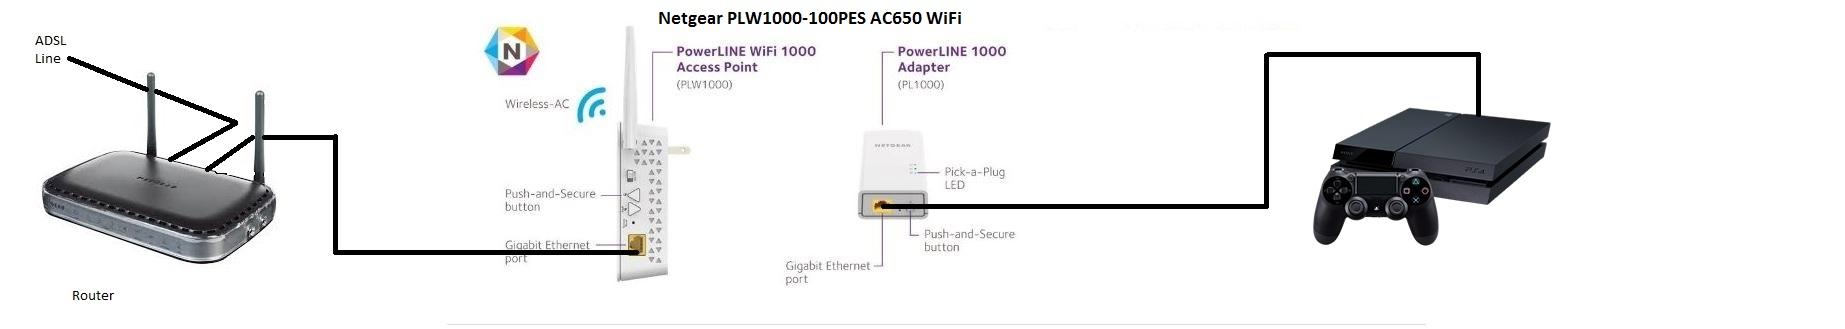 Netgear PLW1000-100PES AC650 WiFi.JPG